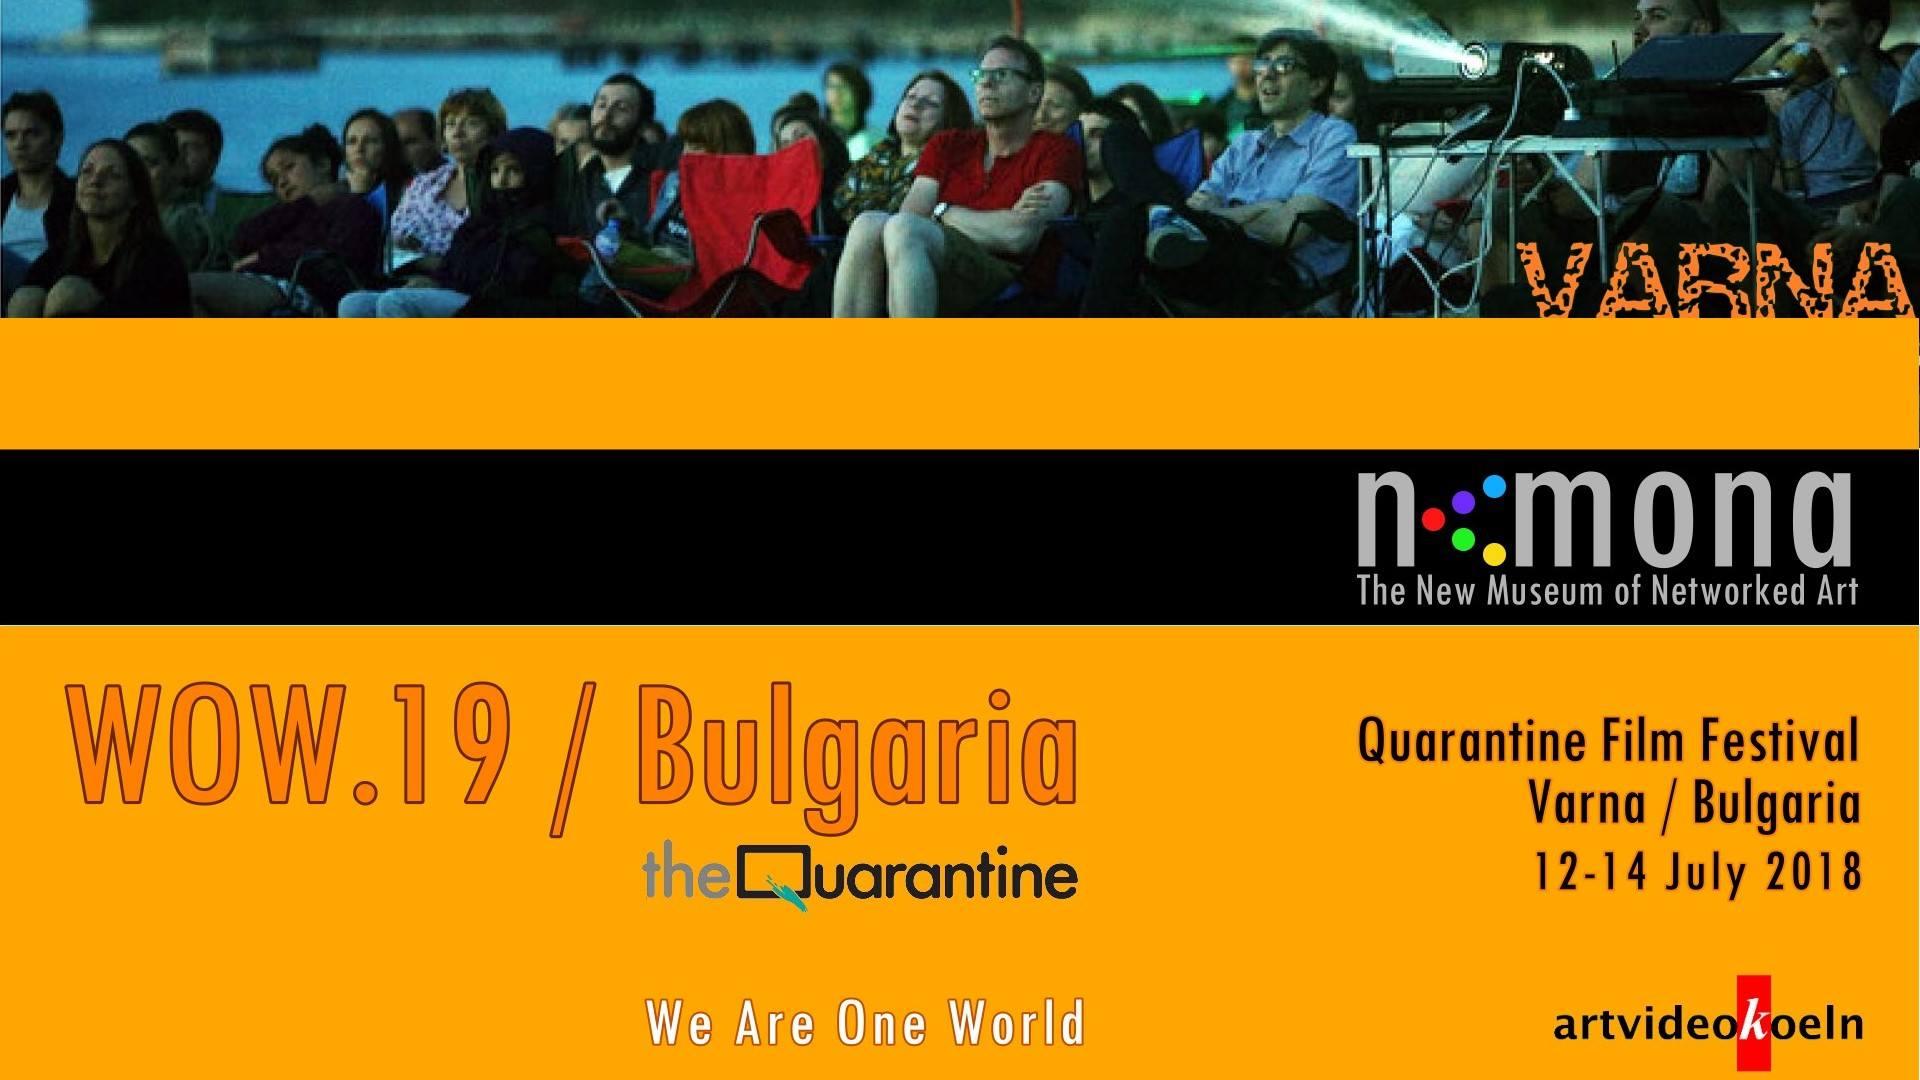 WOW.19 / Bulgaria